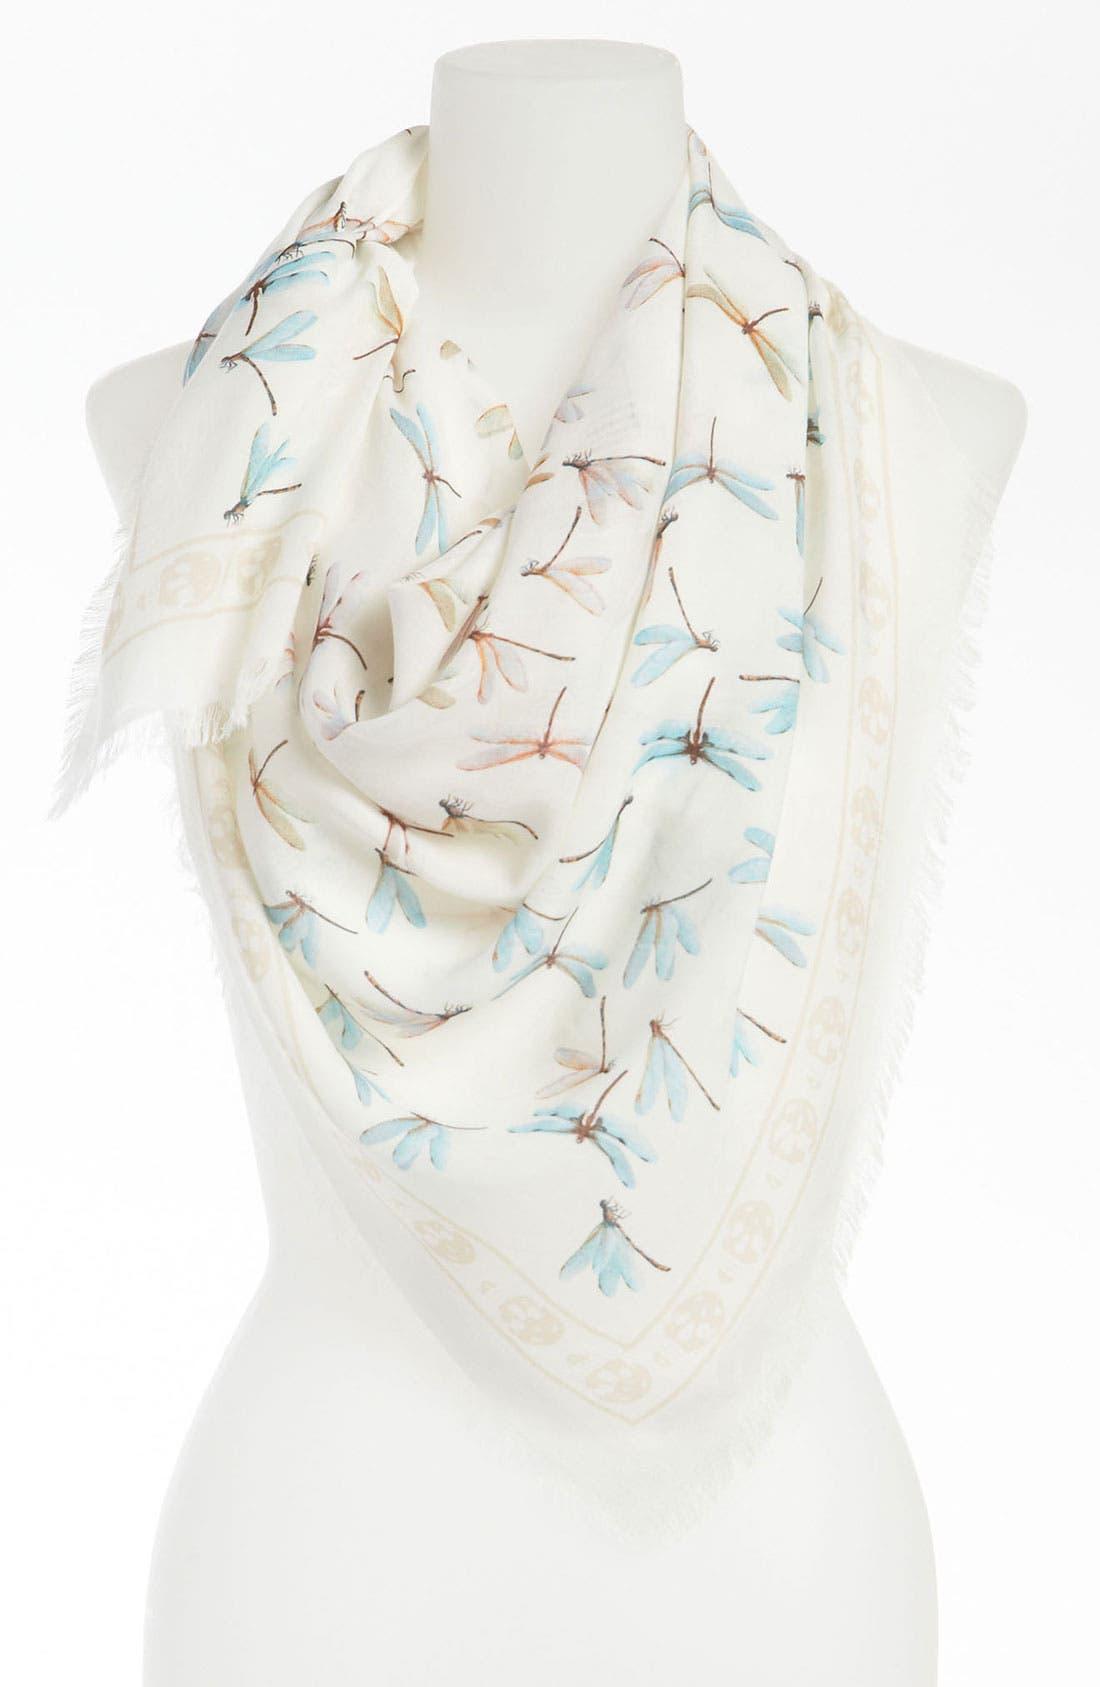 Main Image - Alexander McQueen 'Dragonflies' Scarf